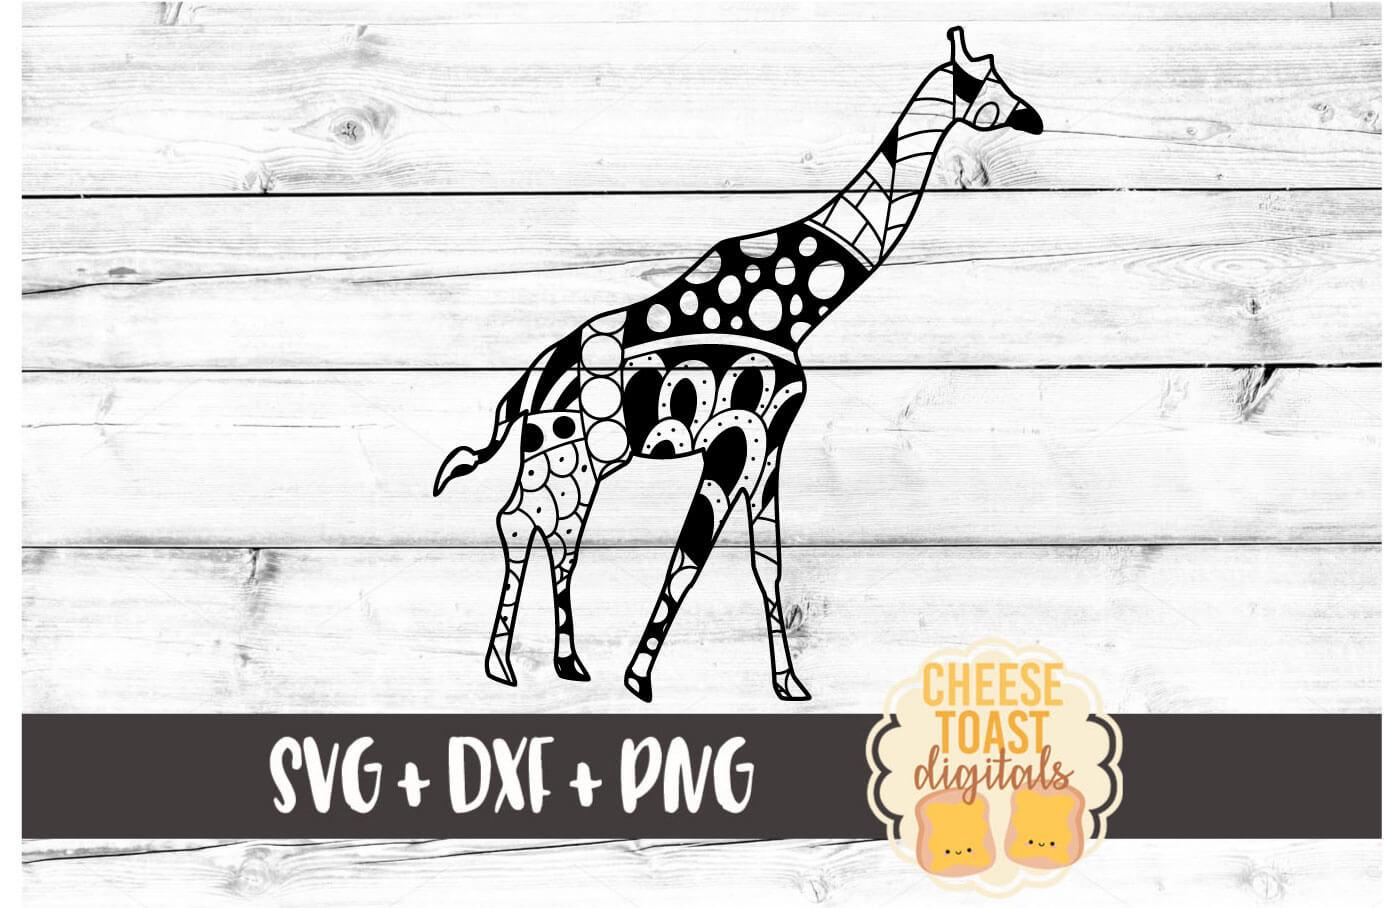 Giraffe - Zen Doodle Art - Animal SVG PNG DXF Files example image 2